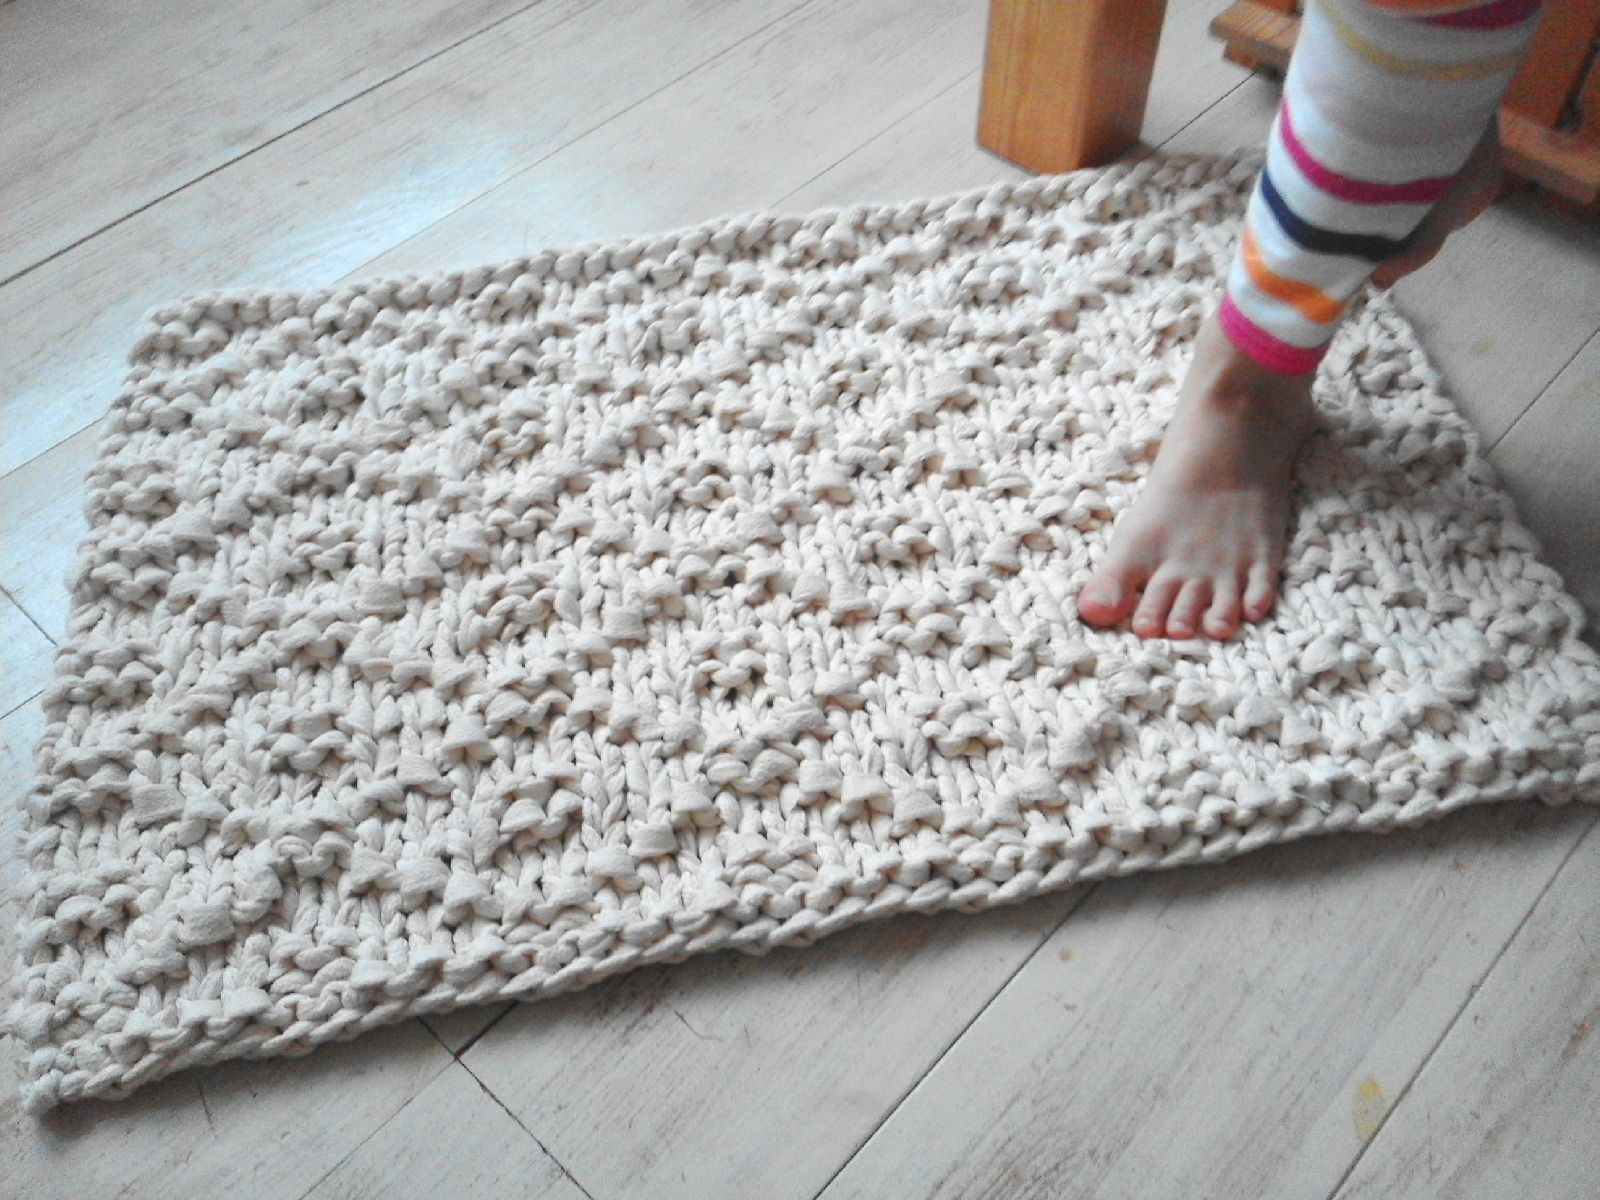 knit bath rug mat from elitai | my works | pinterest | bath rugs